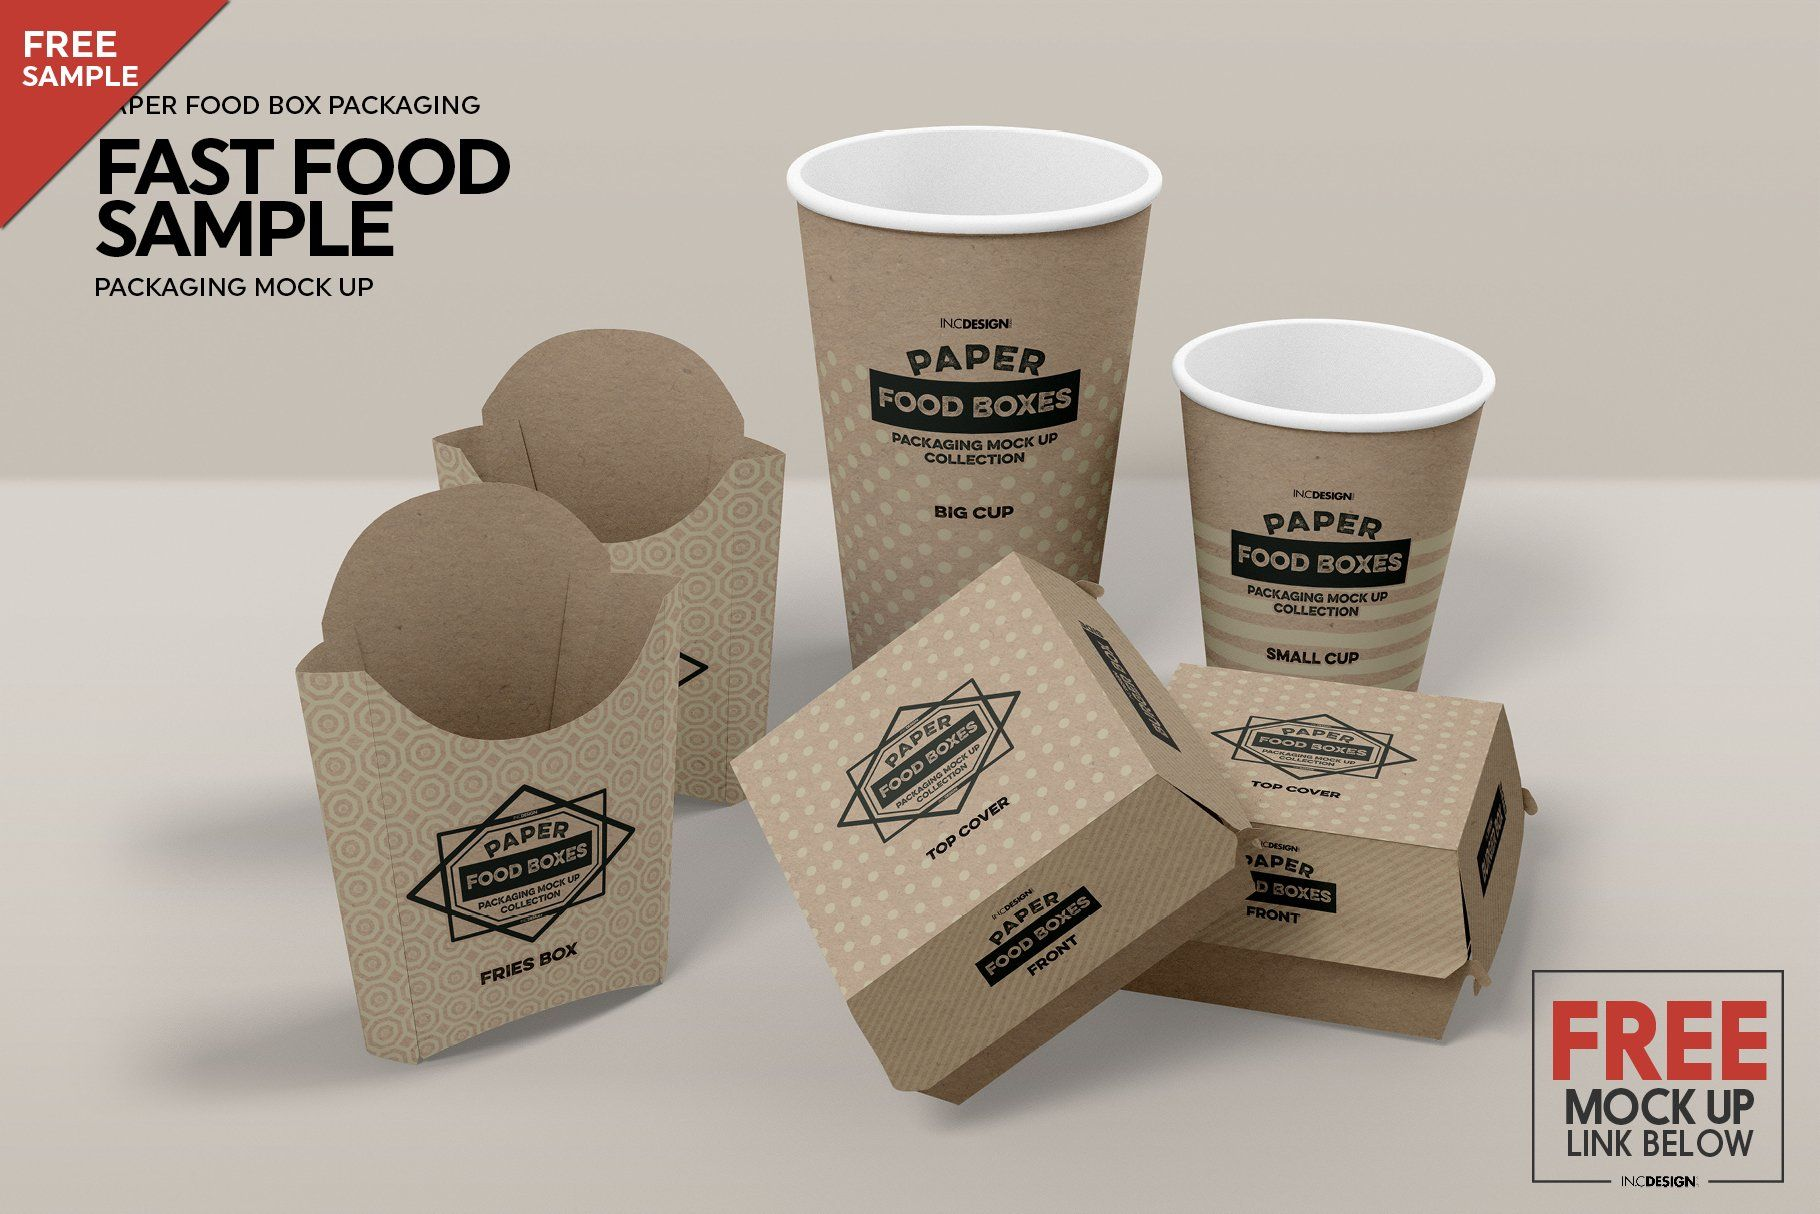 Salad Food Box Packaging Mockup Packaging Mockup Free Fast Food Food Mockup